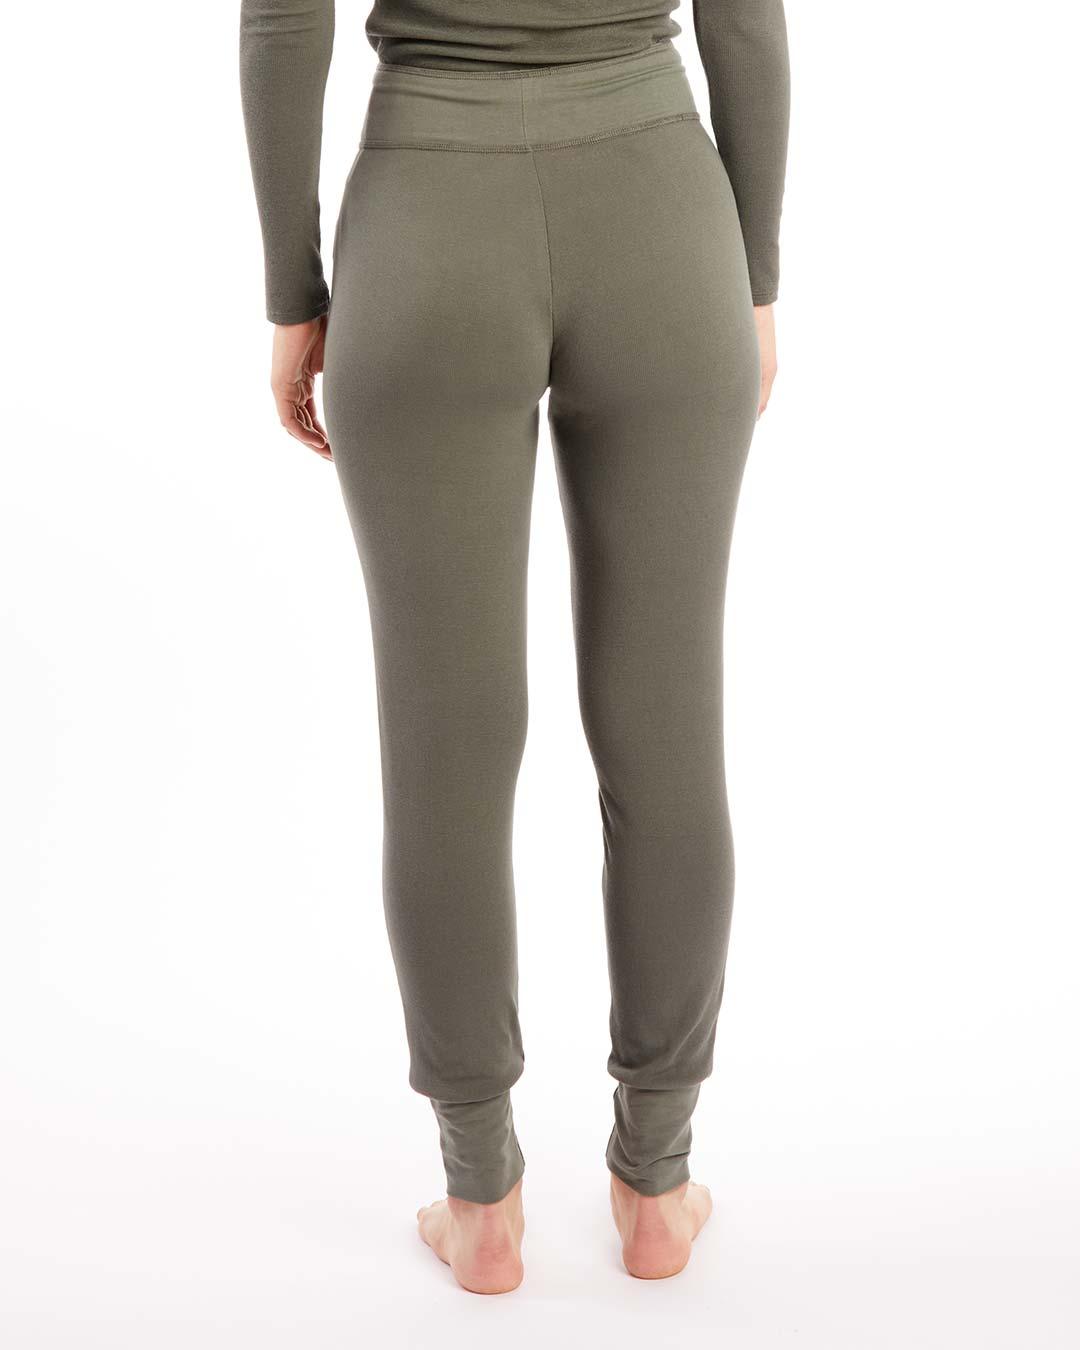 paper-label-danika-jogger-ash-green-back-dianes-lingerie-vancouver-1080x1350